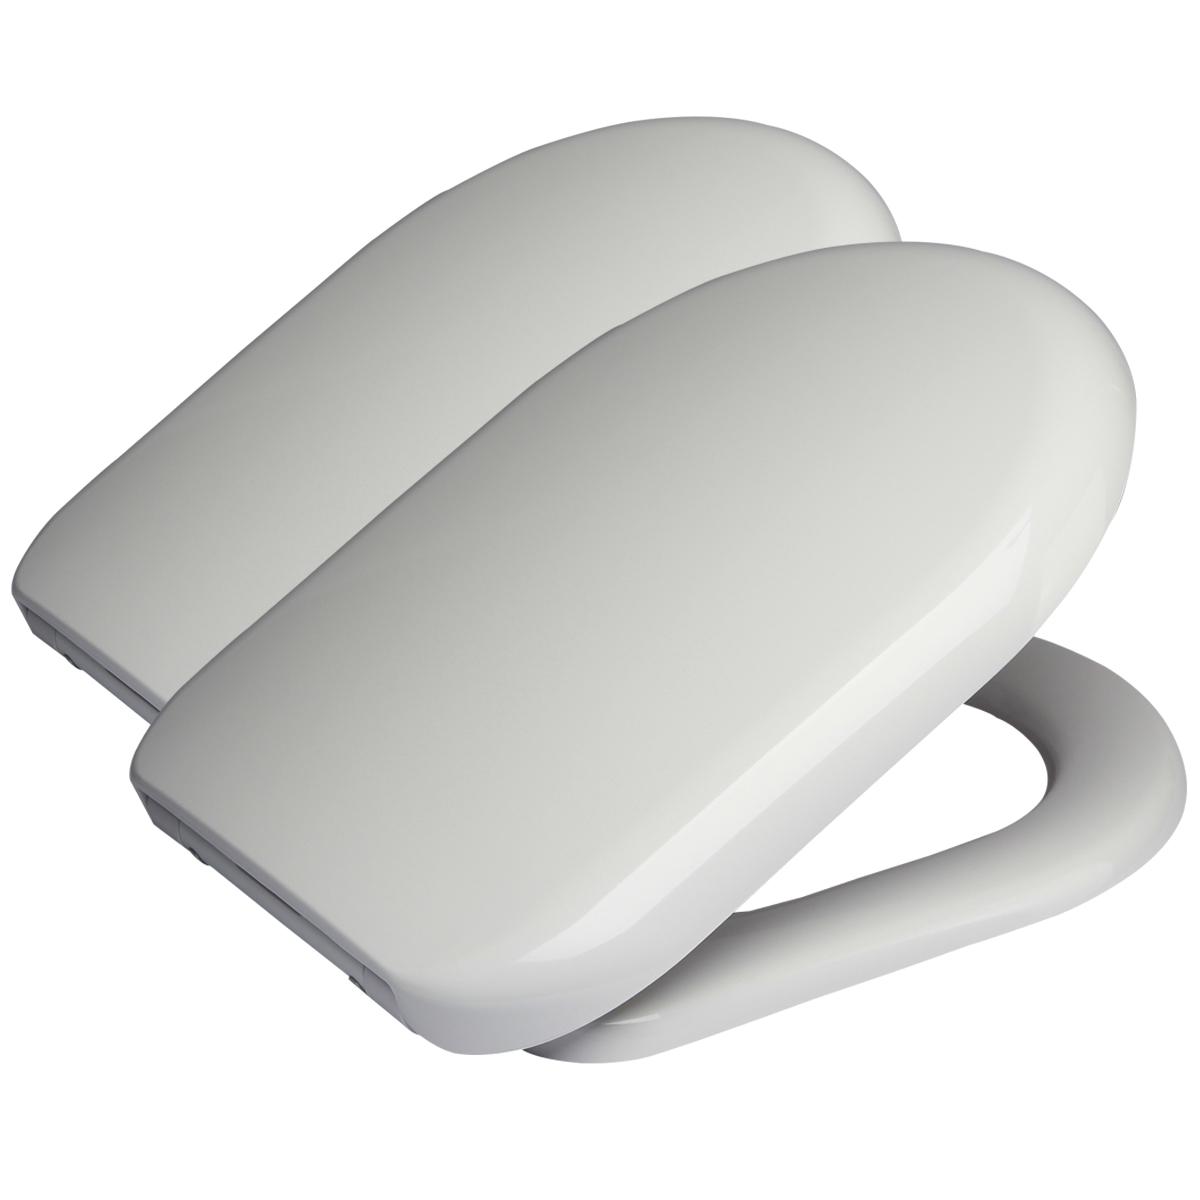 2x wc sitz klodeckel toilettensitz duroplast. Black Bedroom Furniture Sets. Home Design Ideas